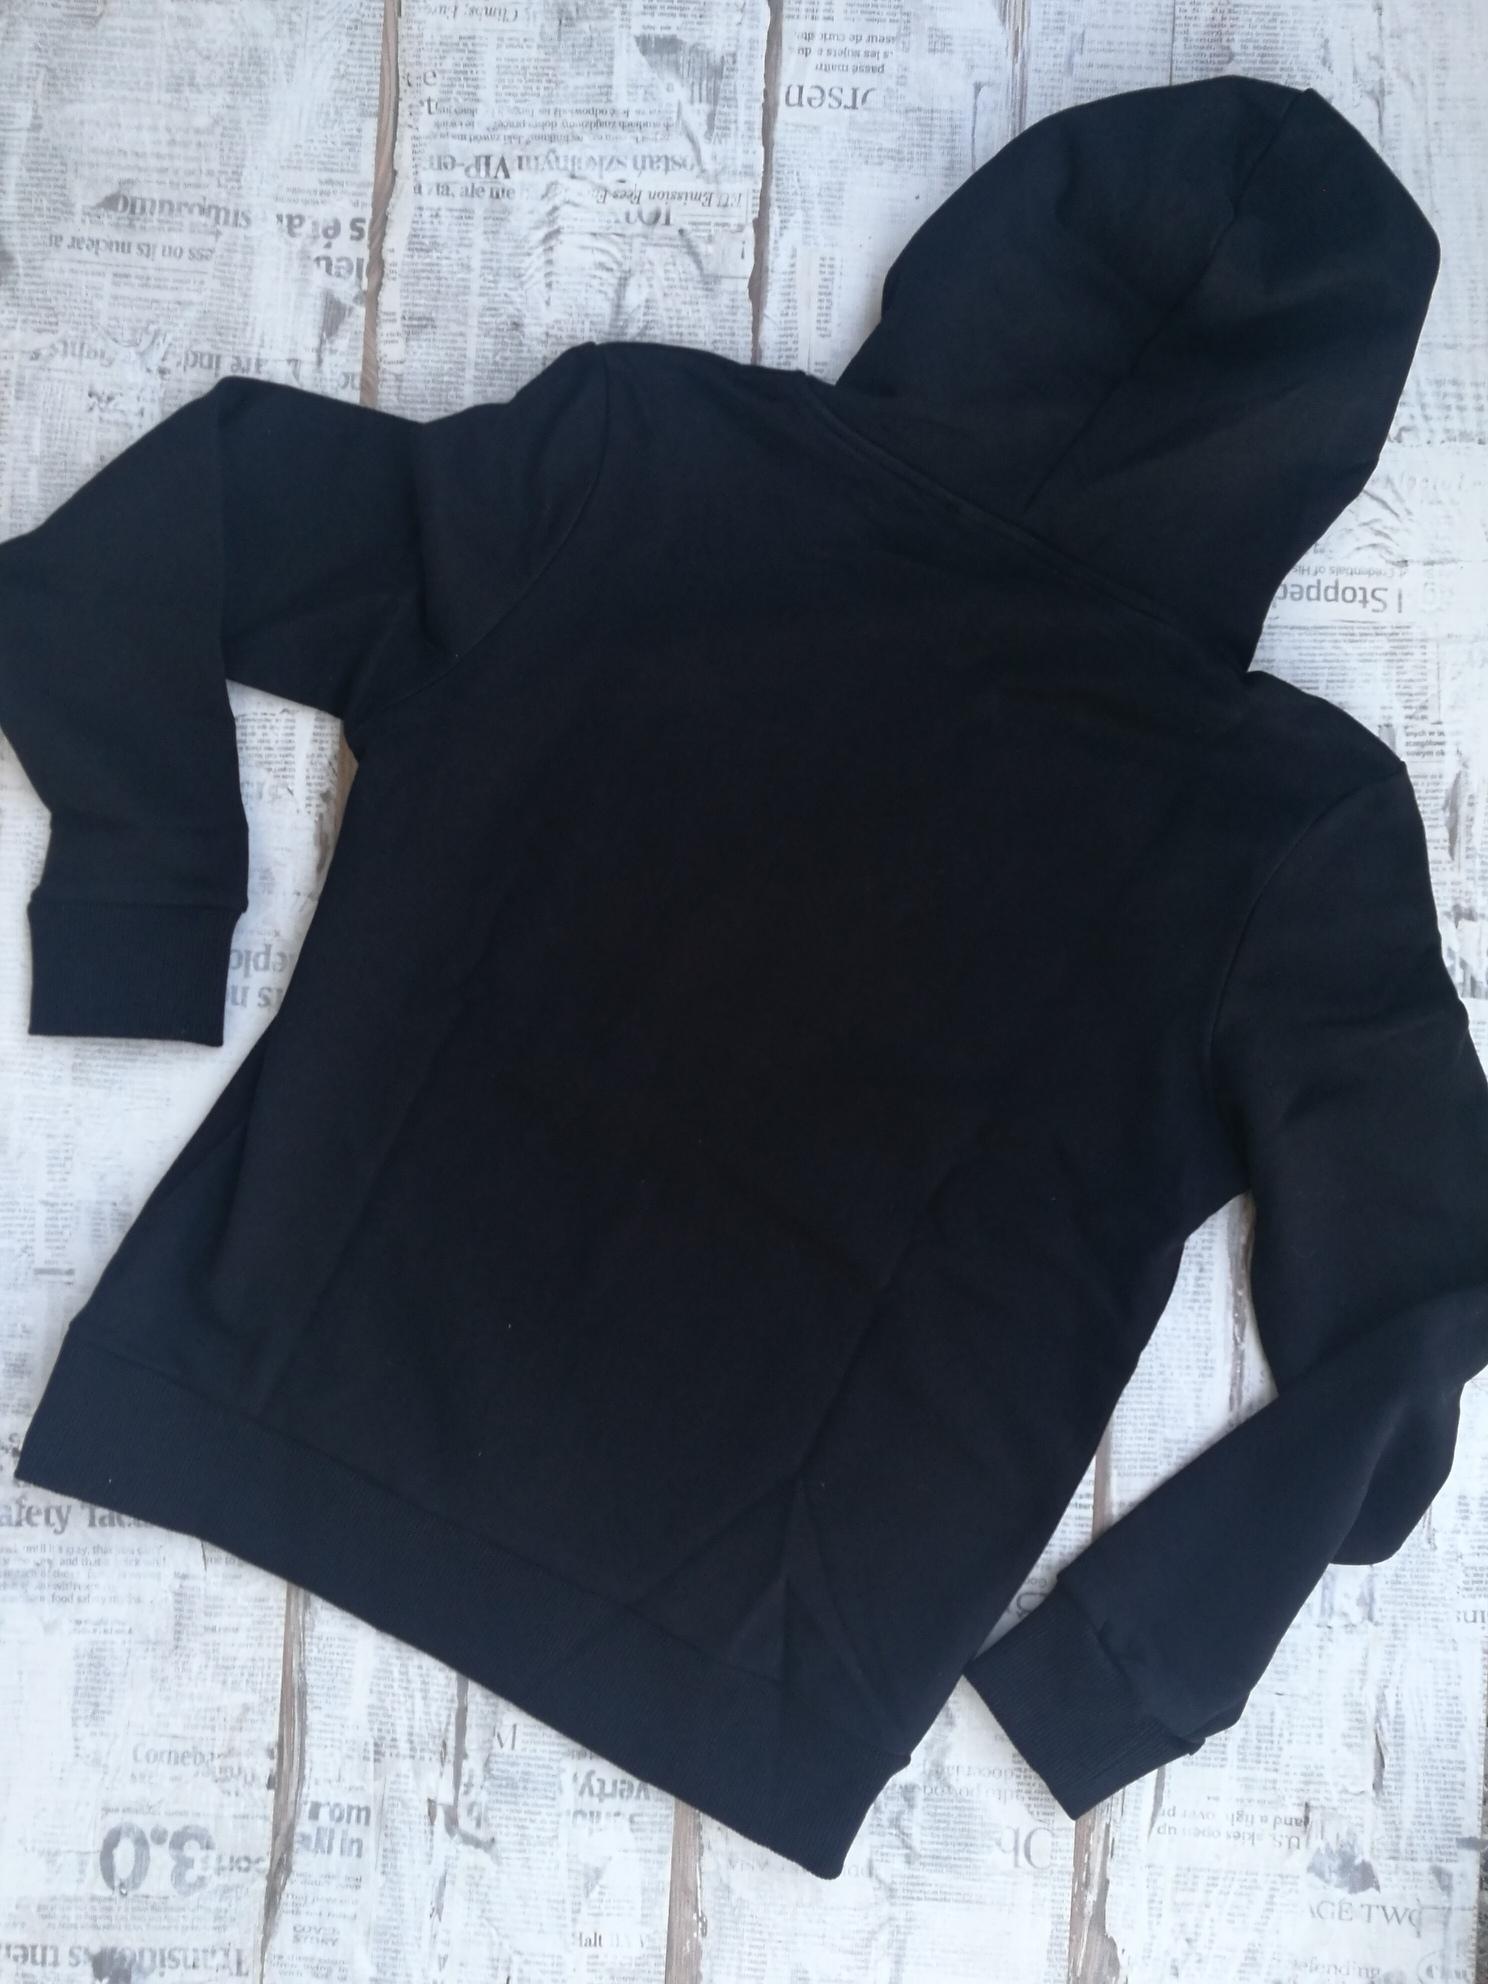 91ae941e Gucci Dapper Dan Hooded Cotton Men's Sweatshirt on Storenvy